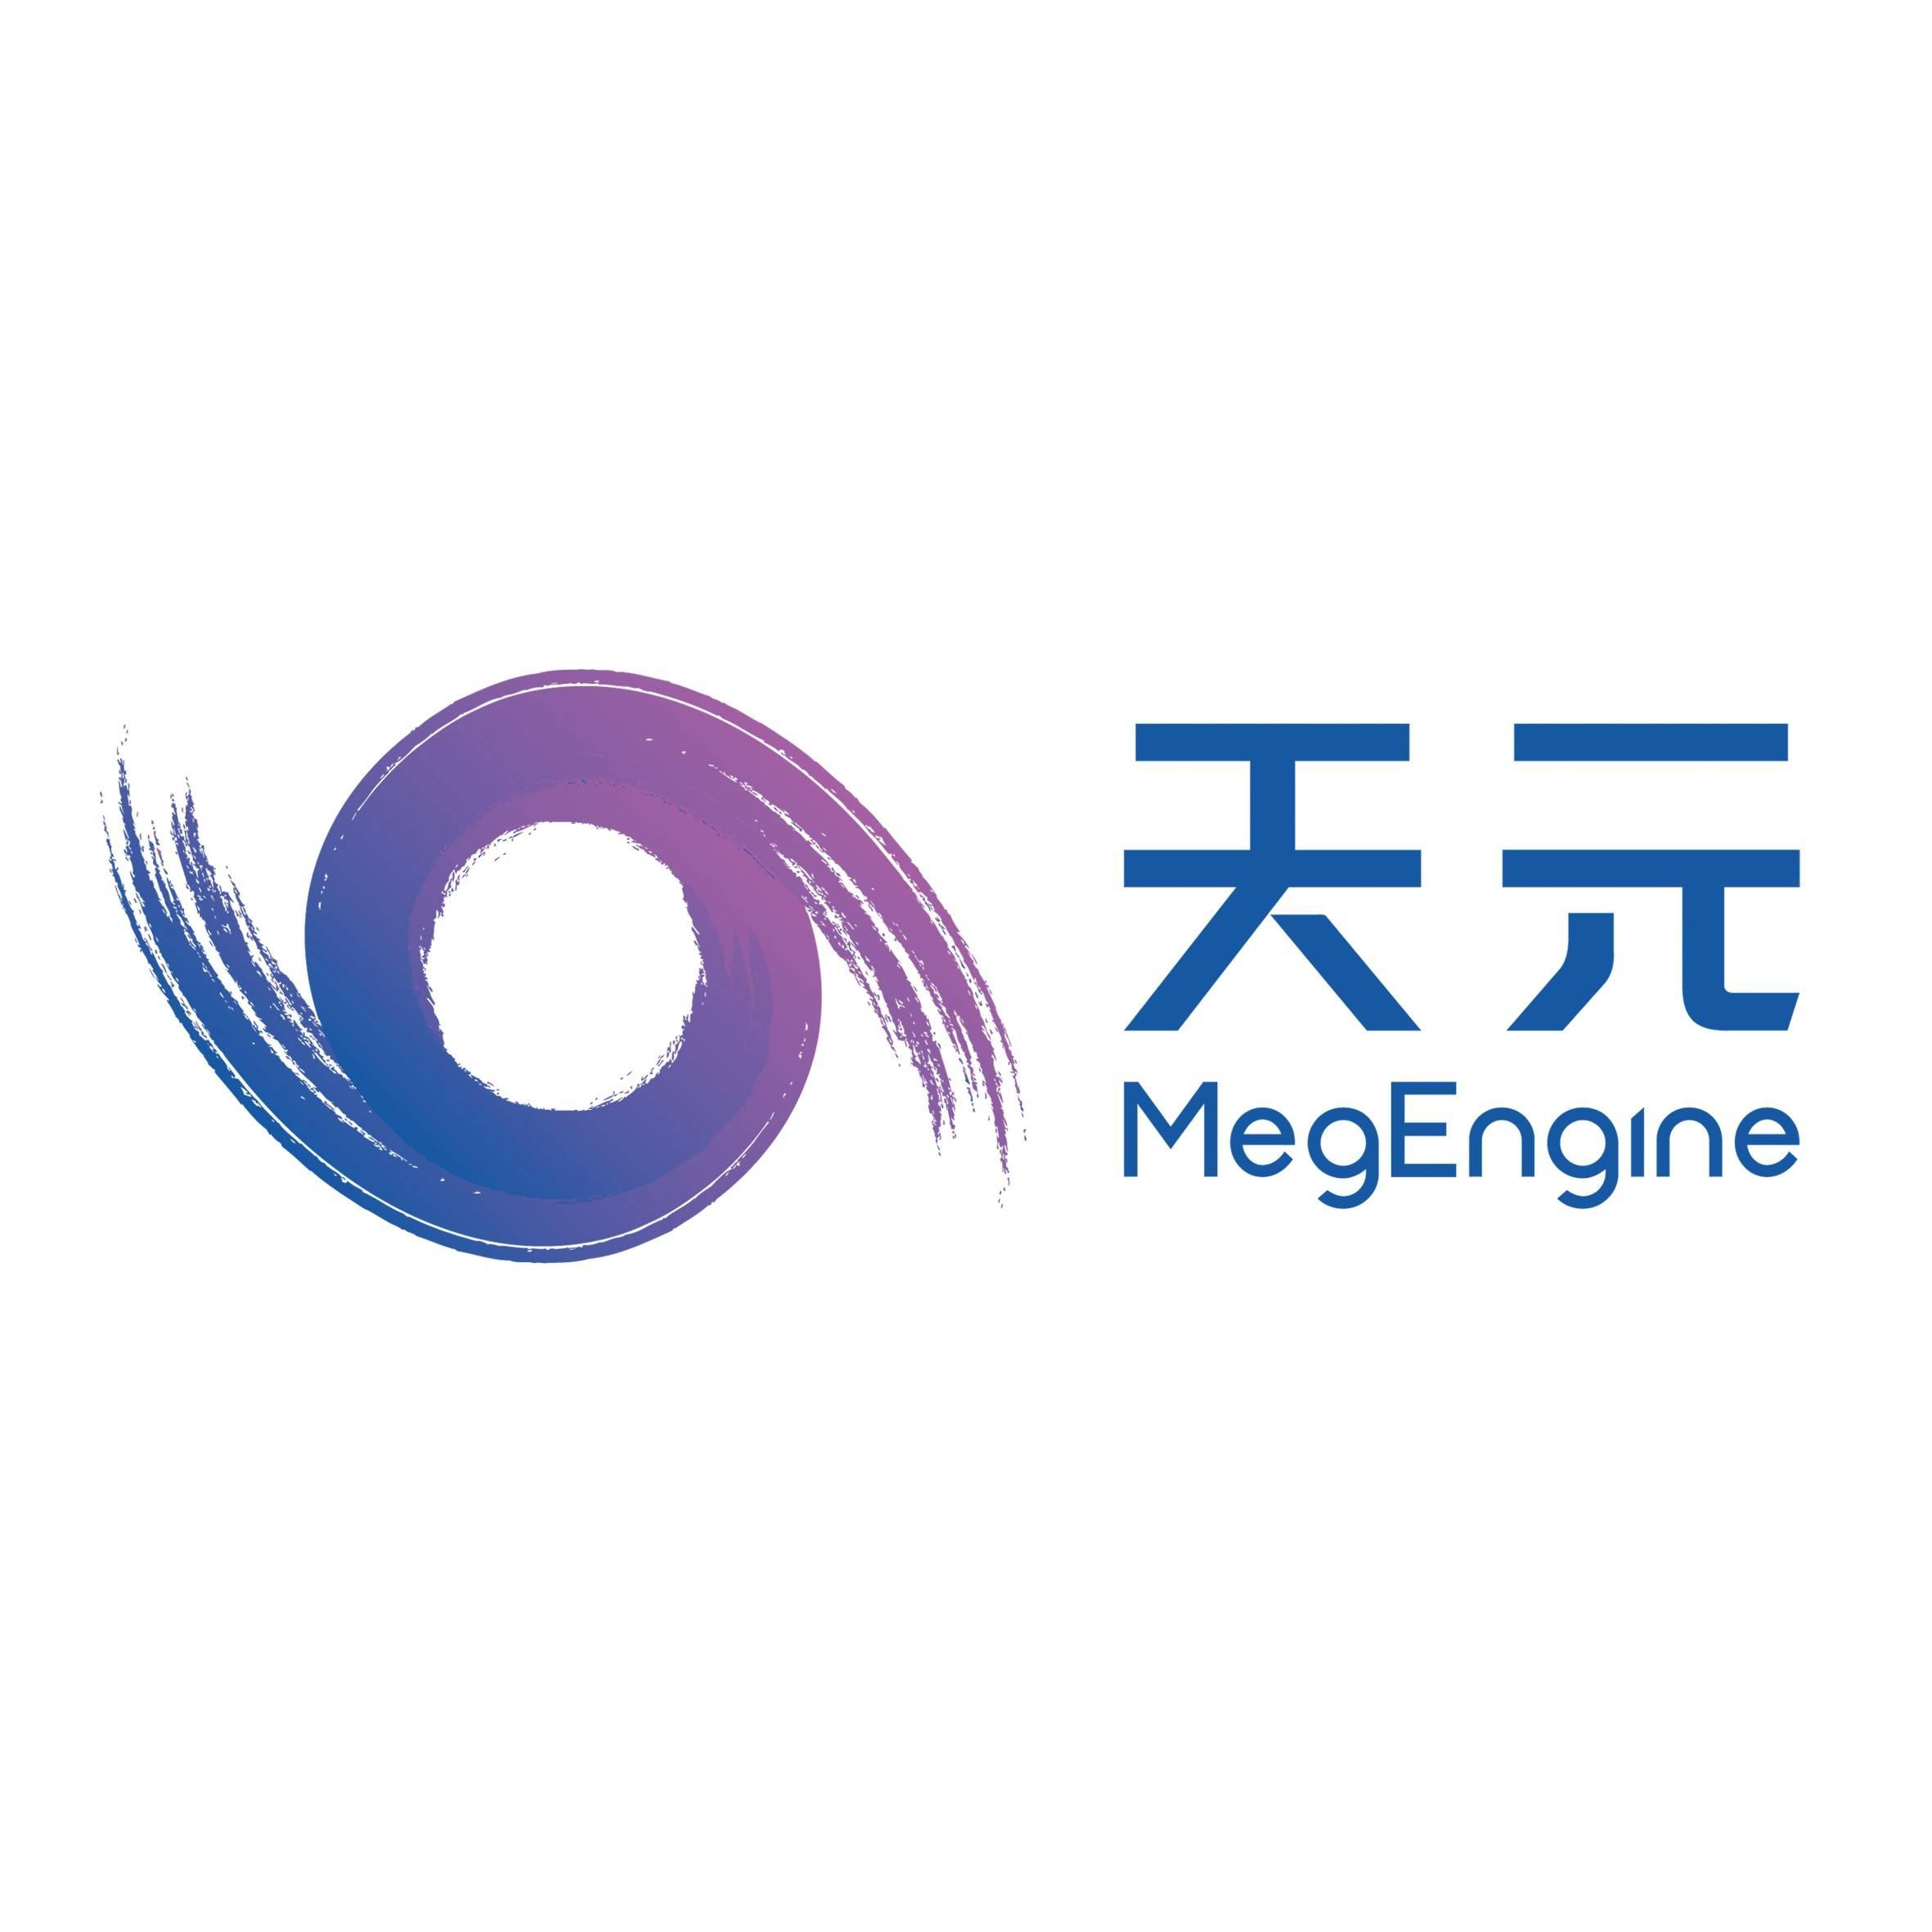 MegEngine